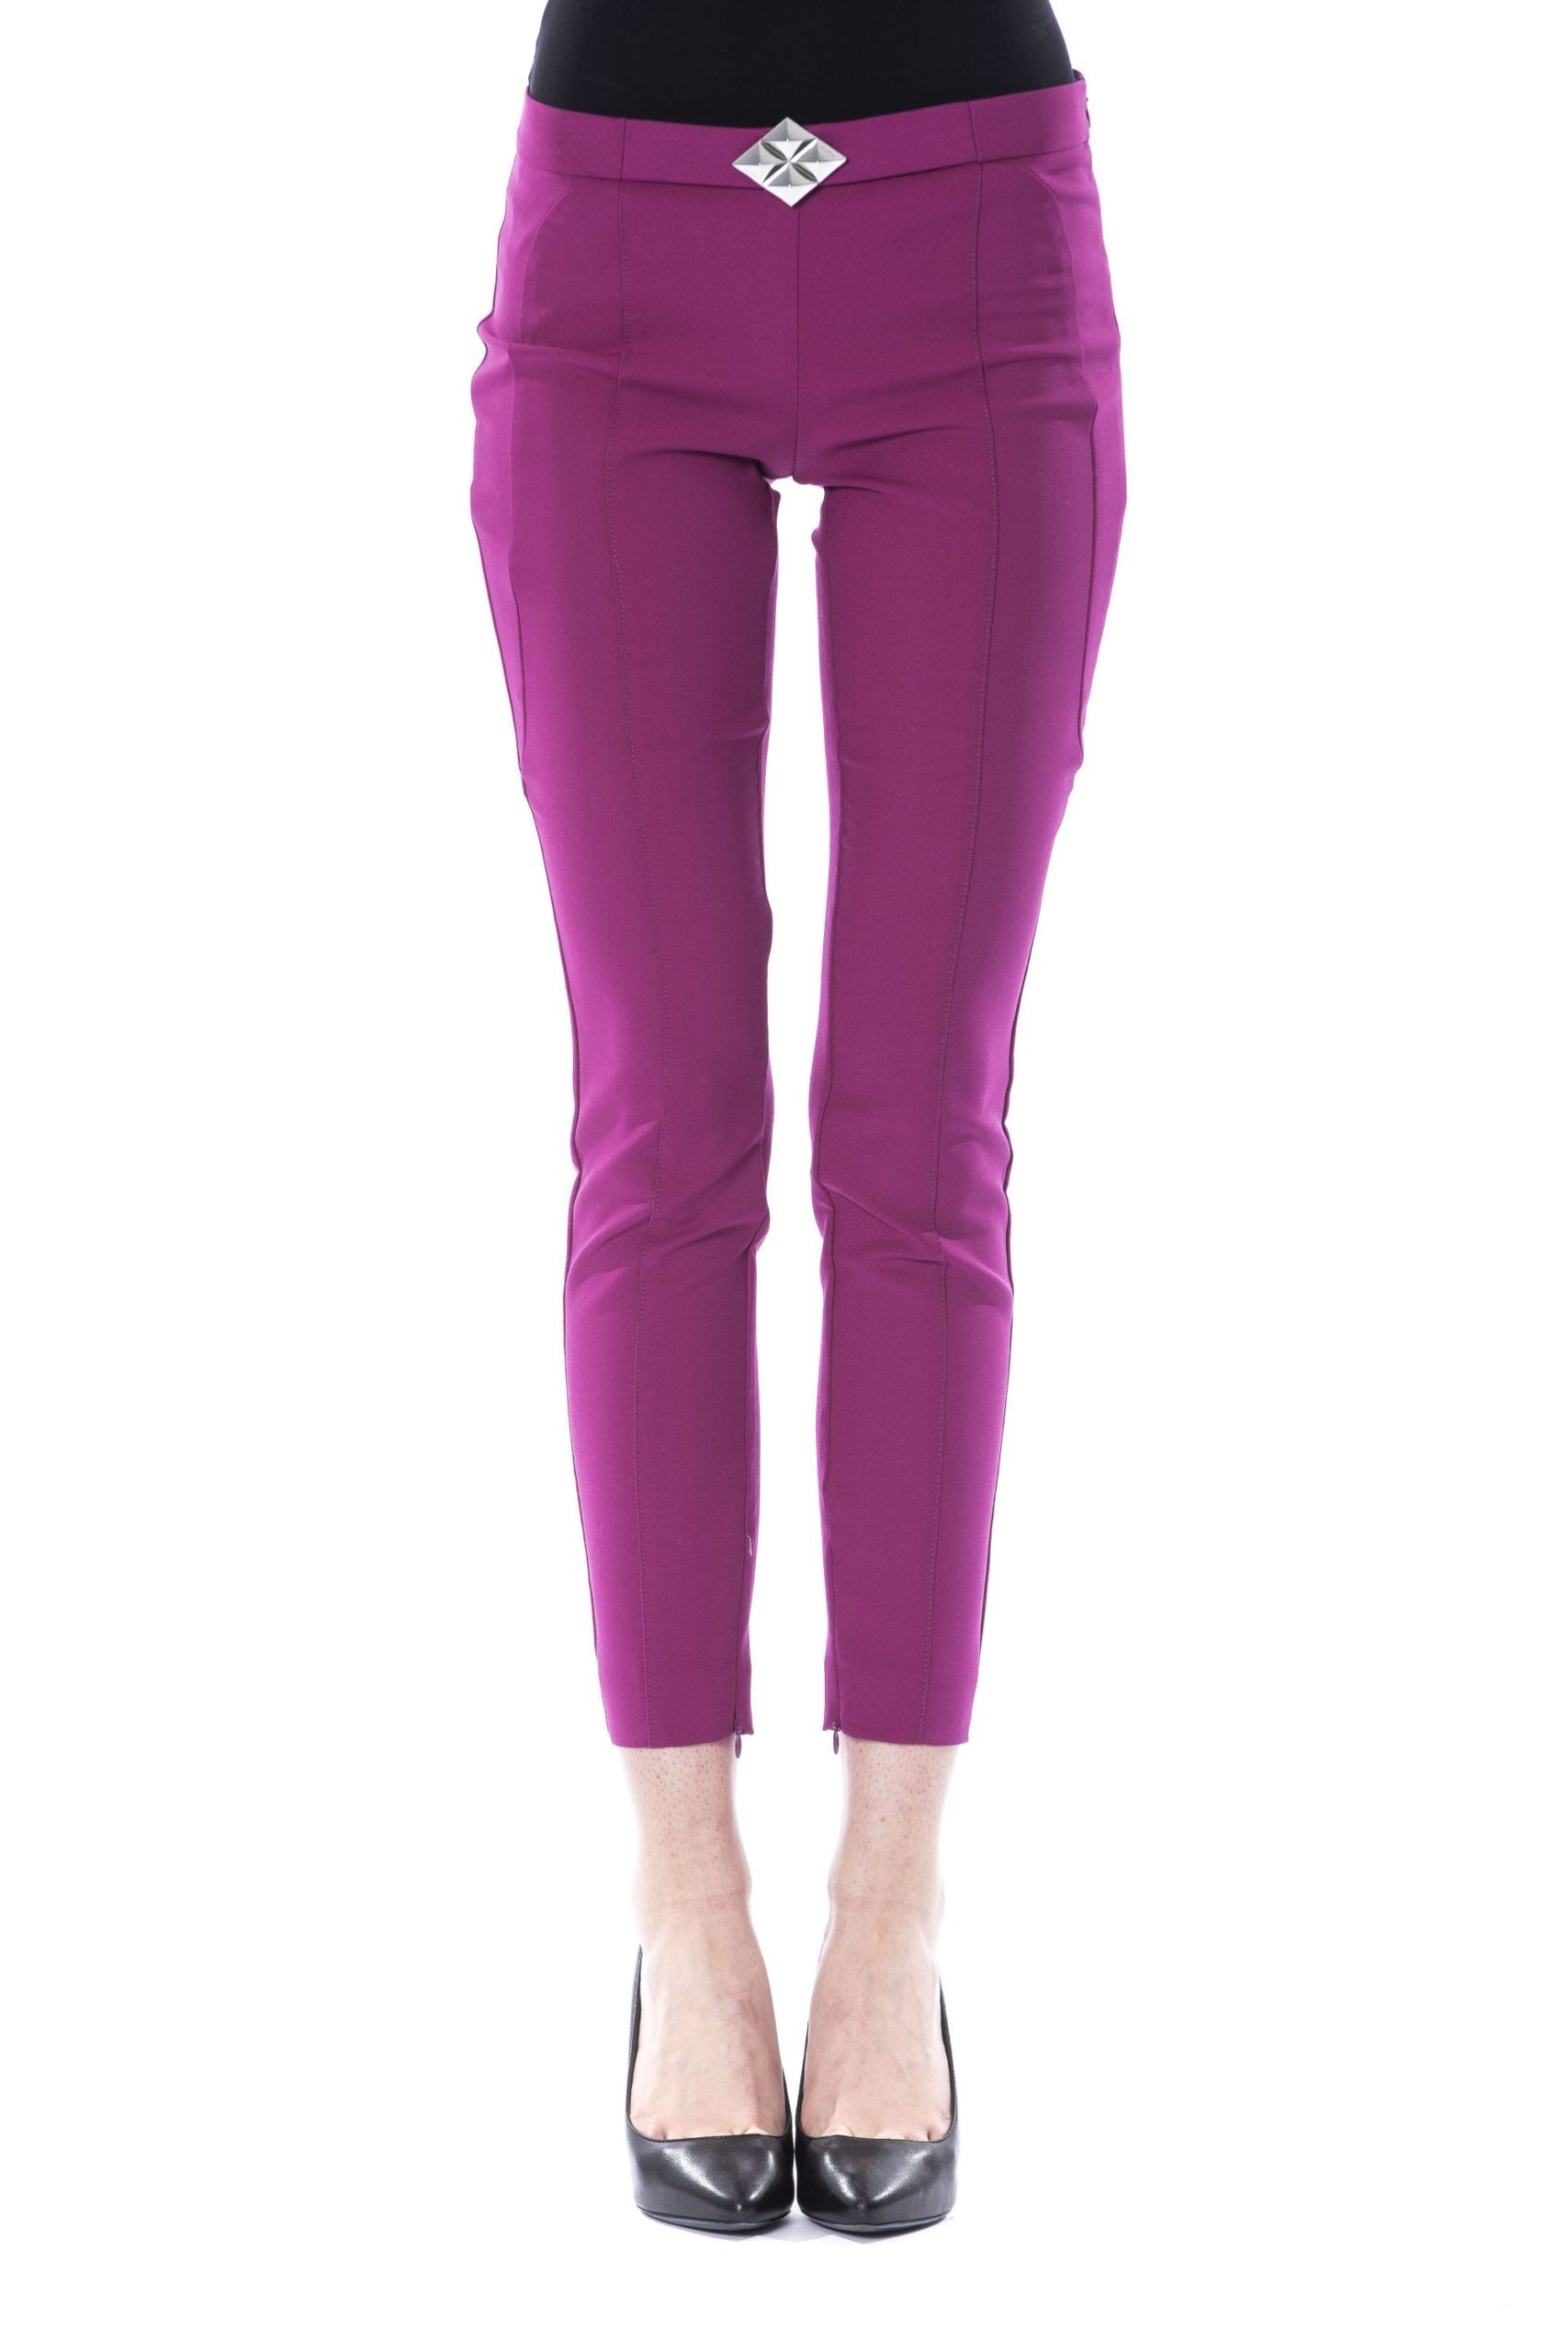 Magentabis Jeans & Pant - IT40   XS